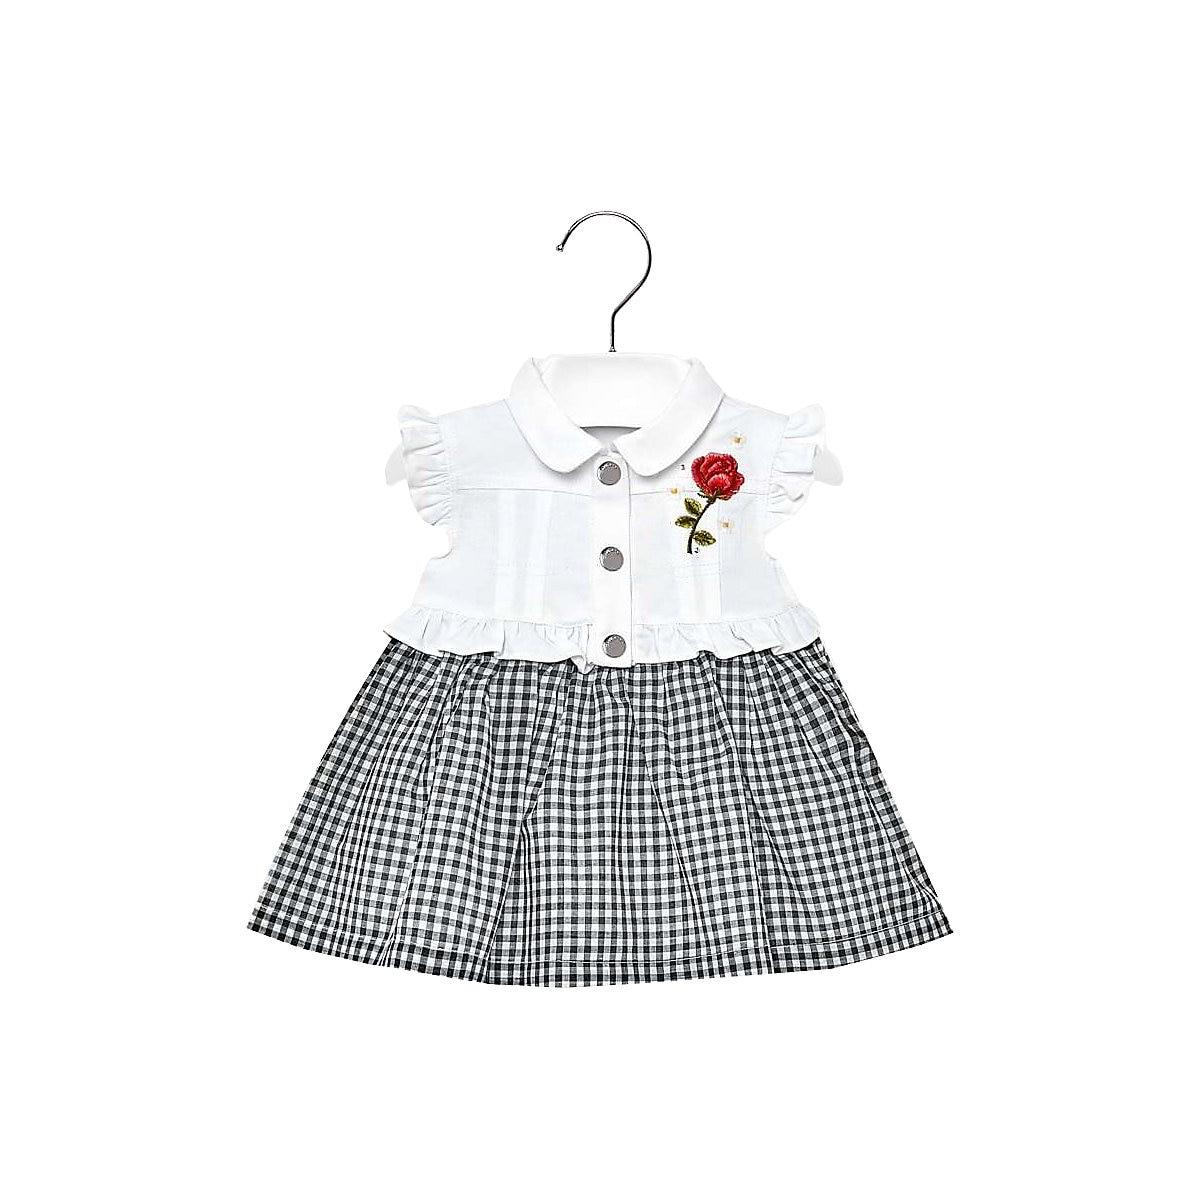 MAYORAL Dresses 10691105 dress for girls baby clothing fashion slim family long sleeve mesh dress for girls